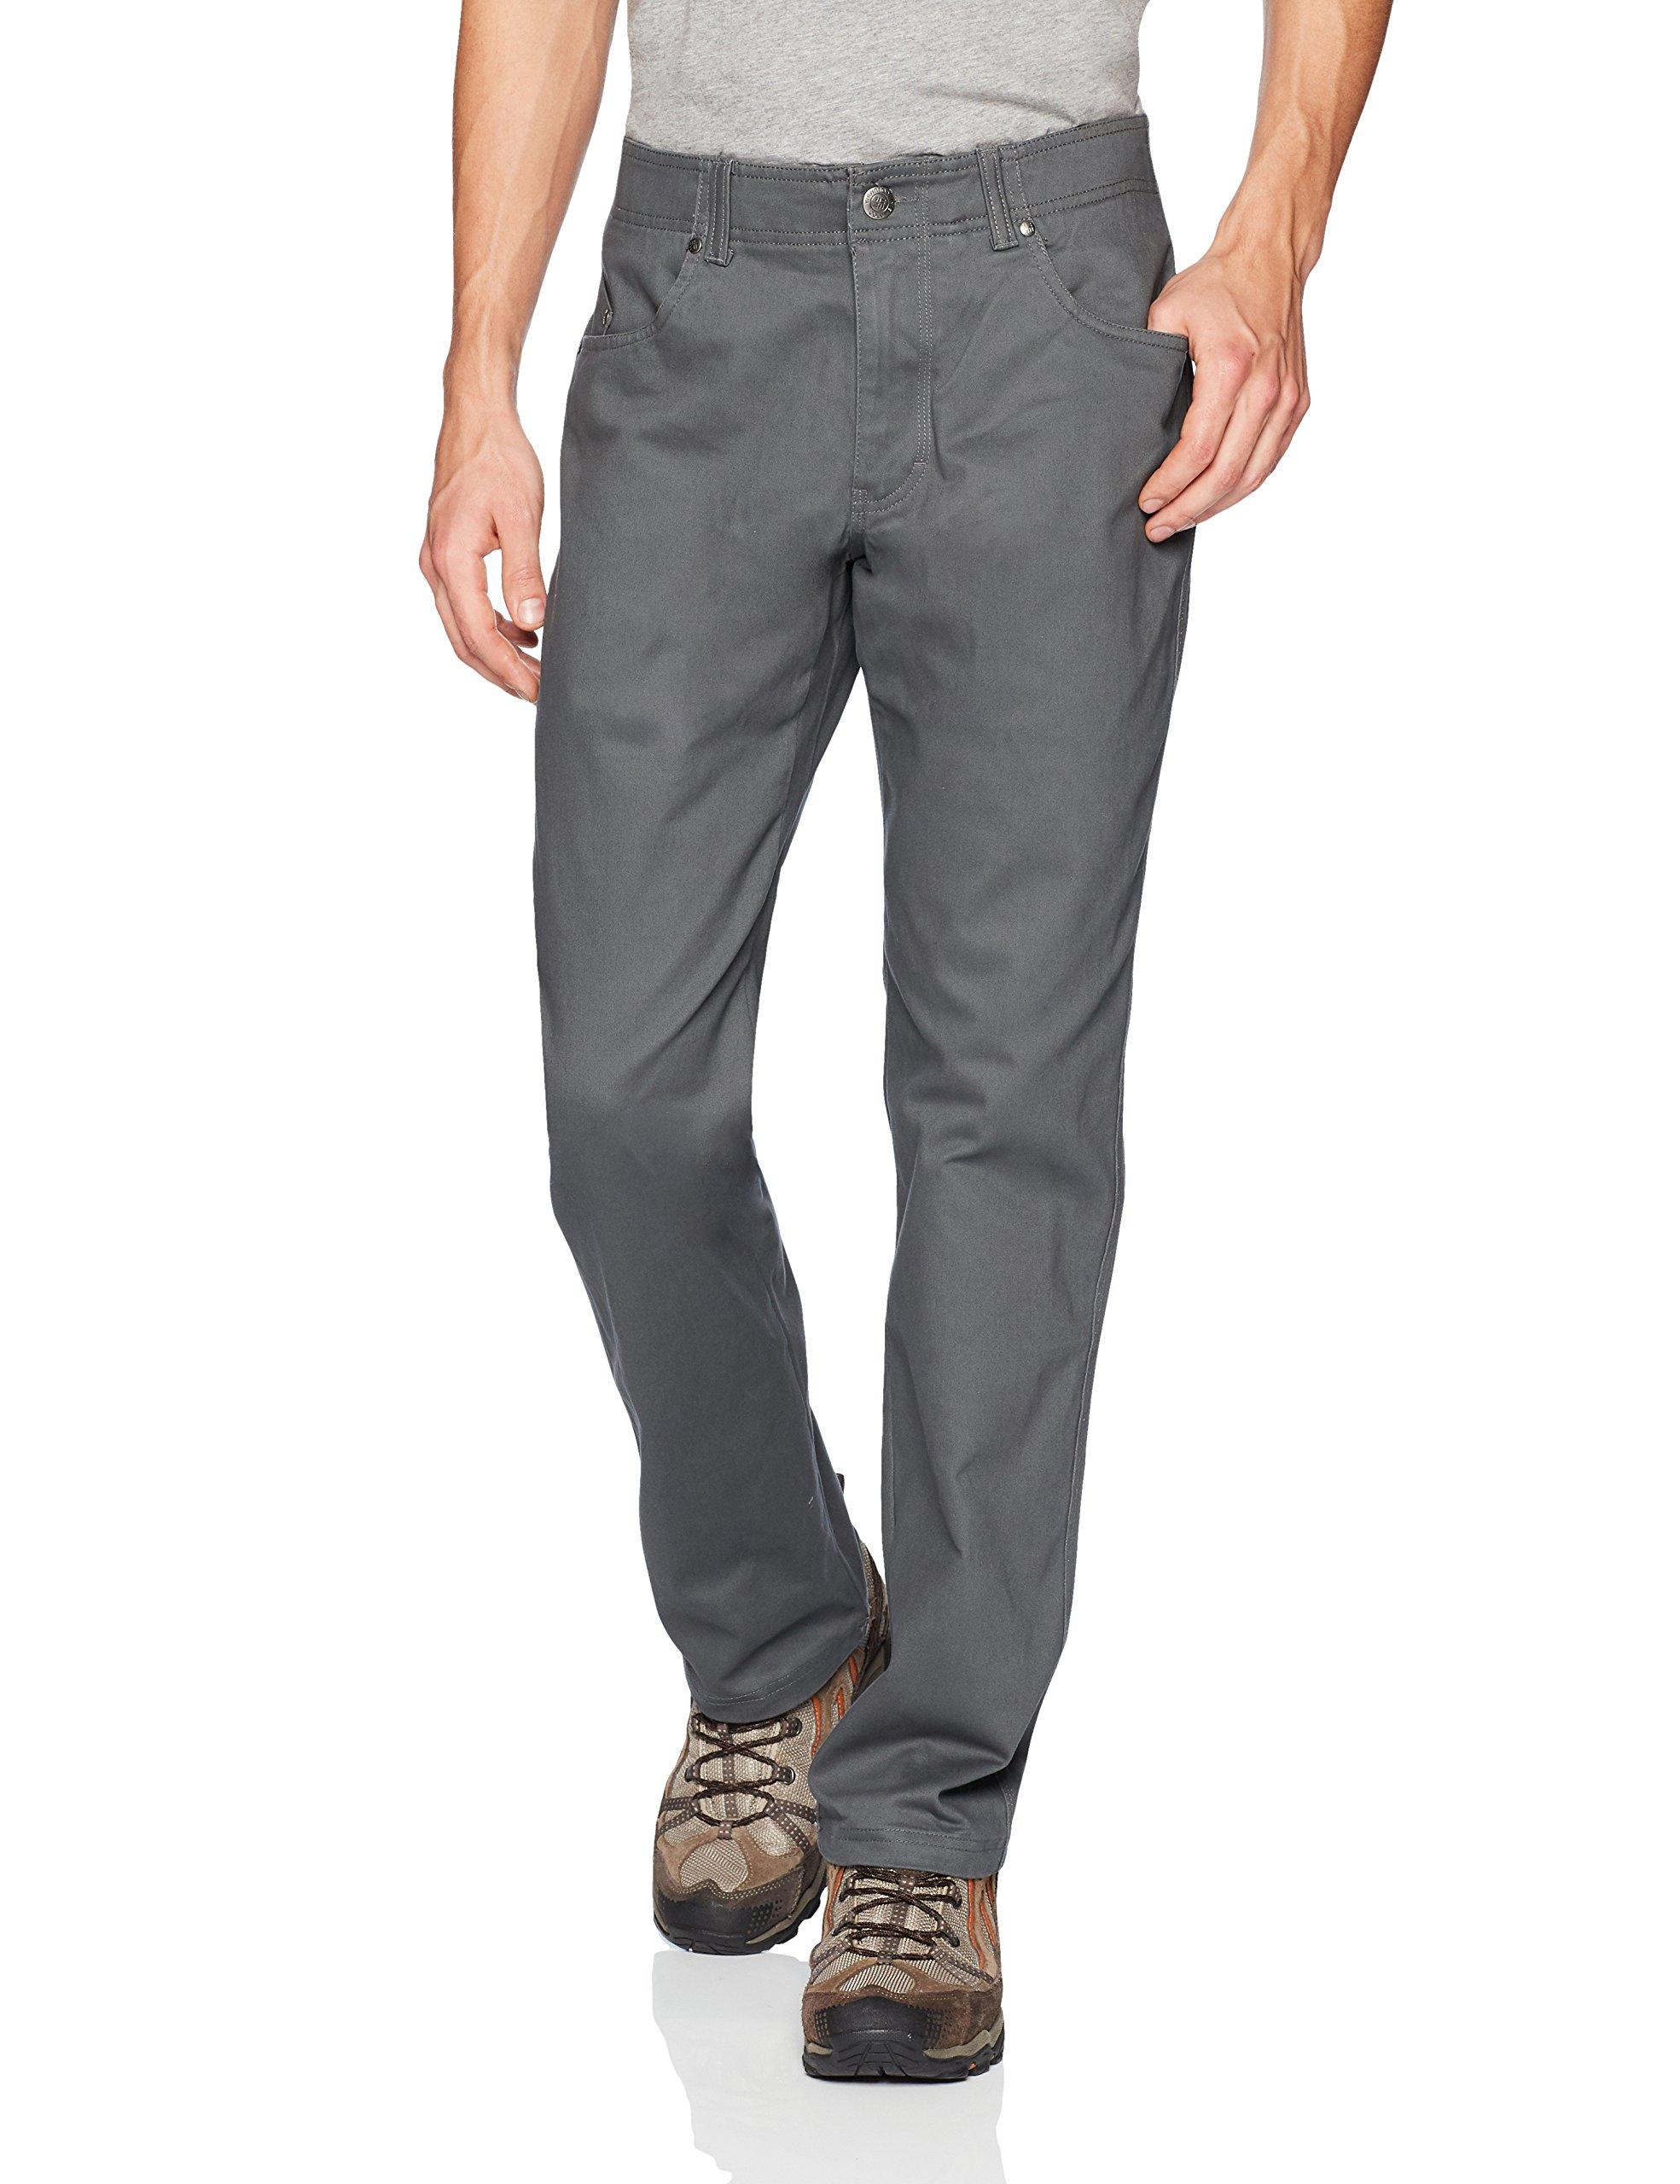 Columbia Men's Pilot Peak 5 Pocket Pant, Grill 44x34